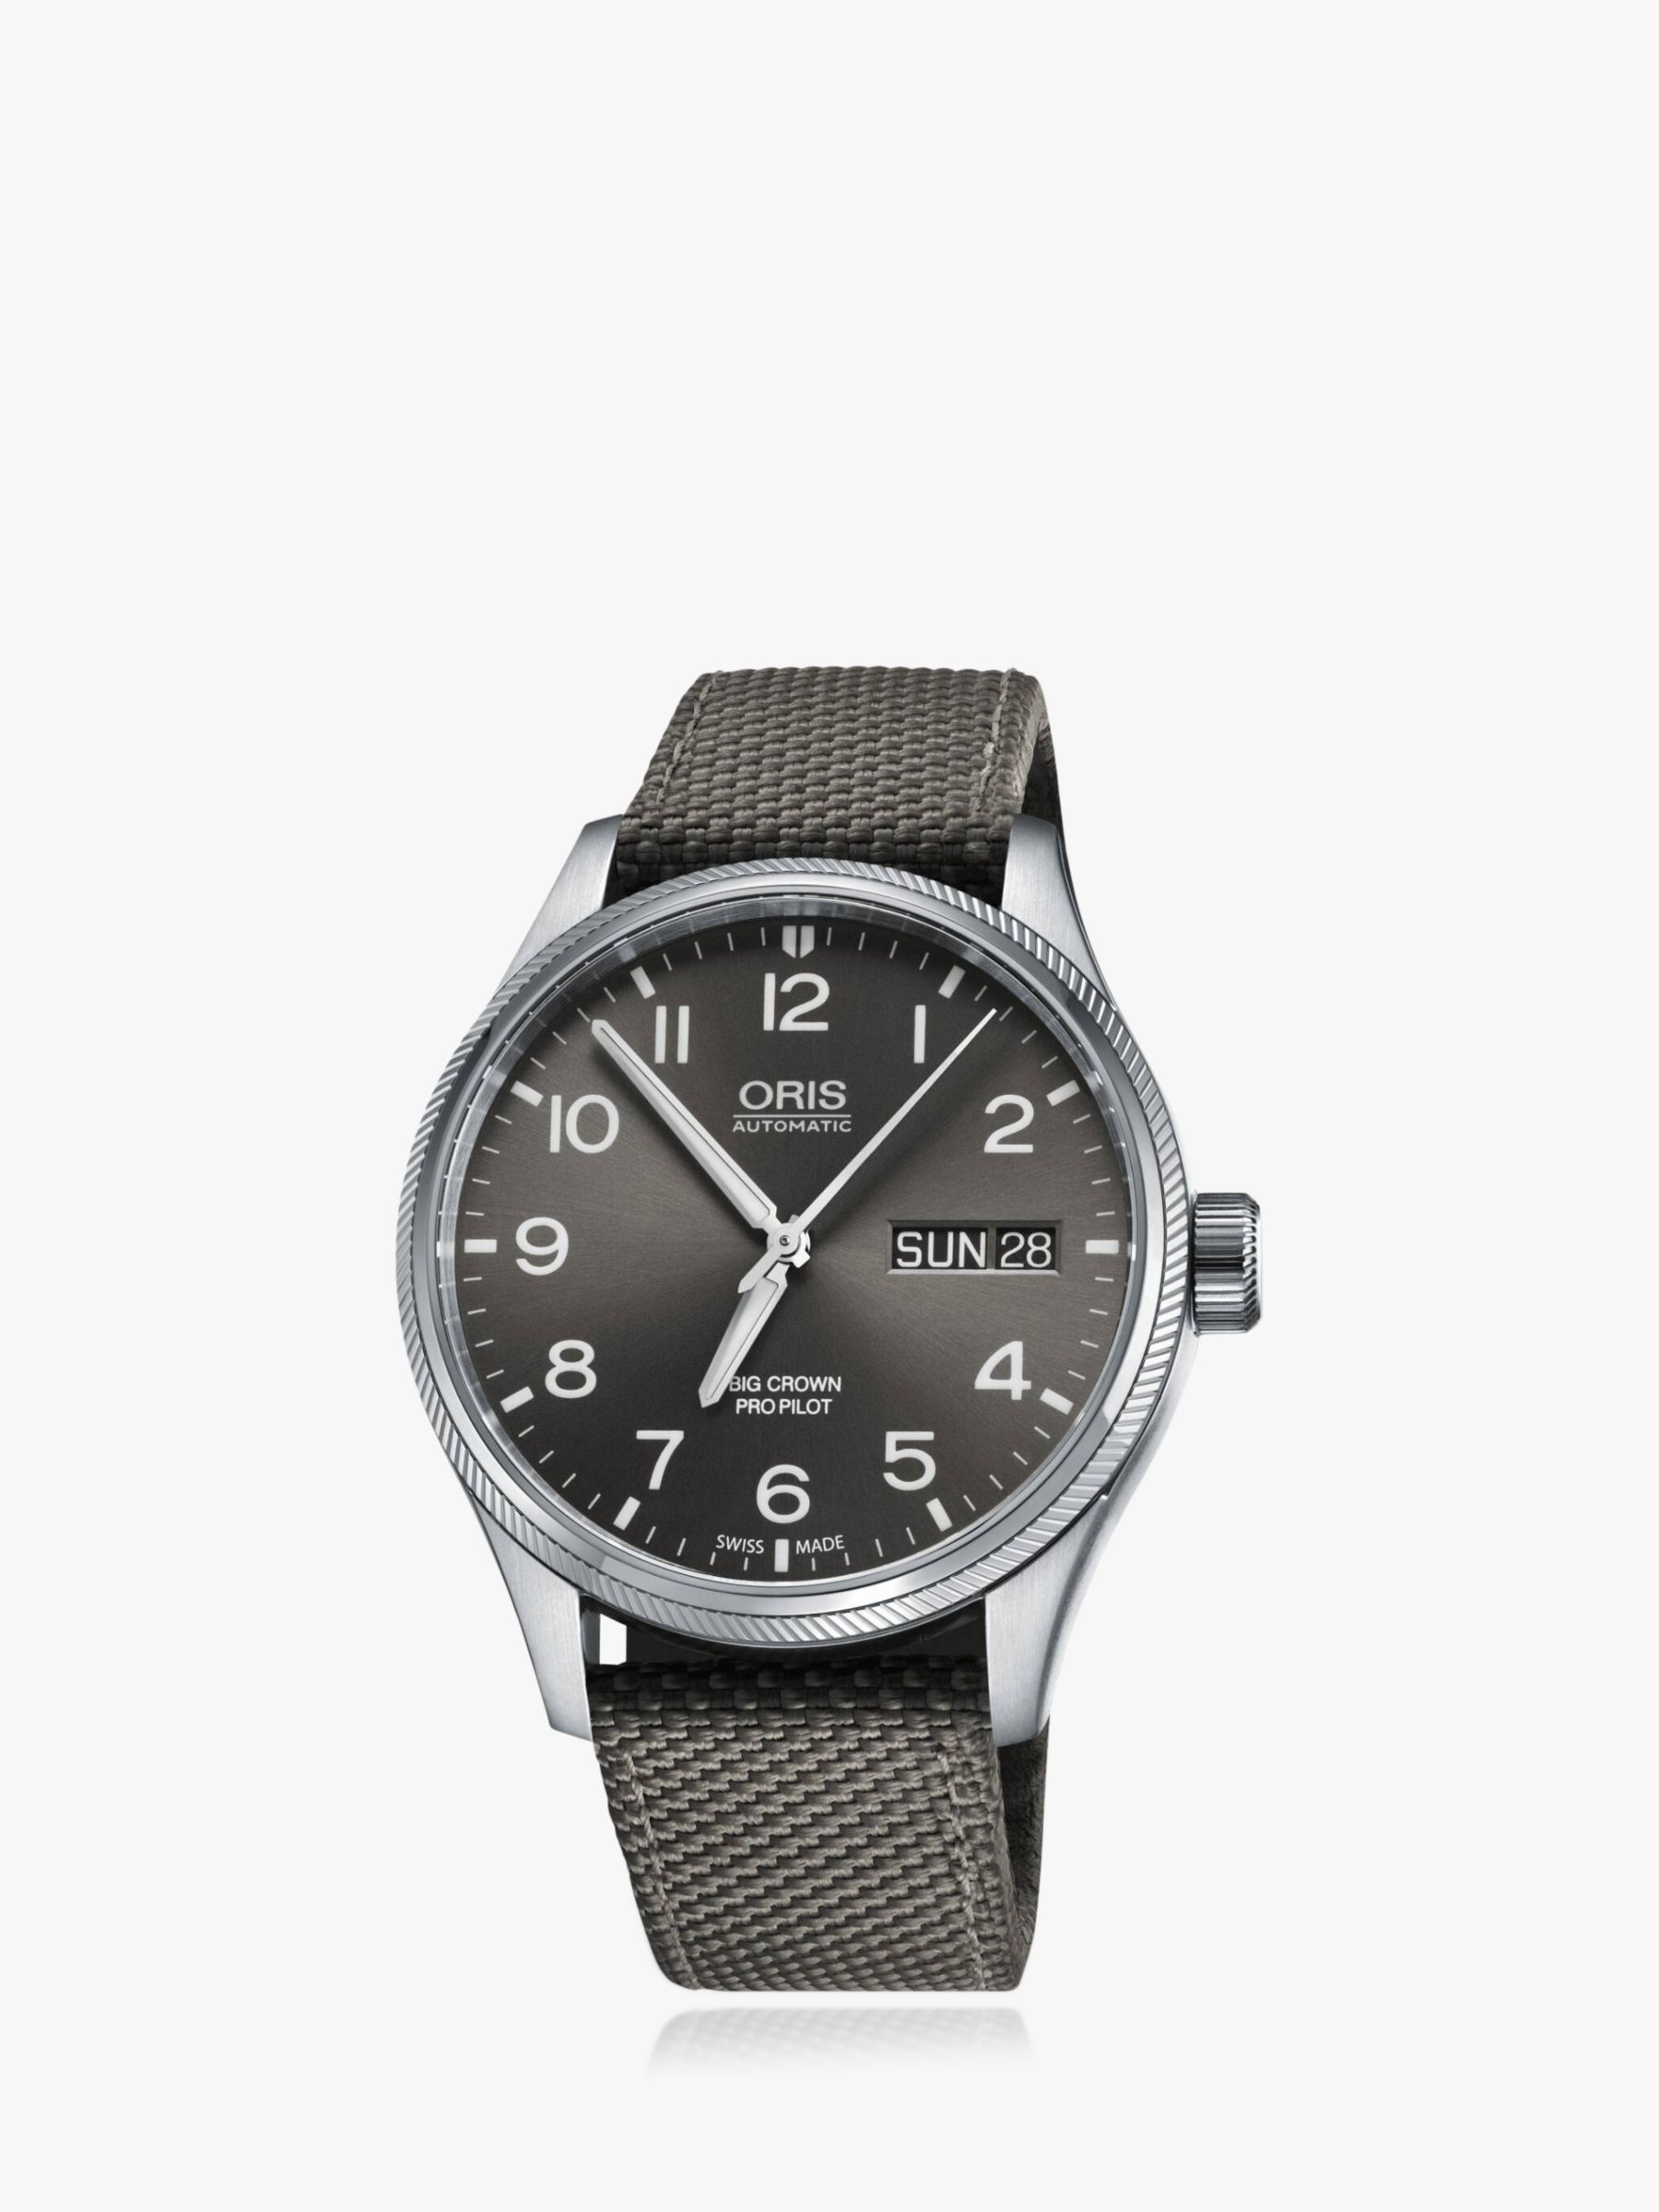 Oris Oris 752 7698 4063-07 5 22 17FC Men's Big Crown Pro Pilot Automatic Date Day Fabric Strap Watch, Grey